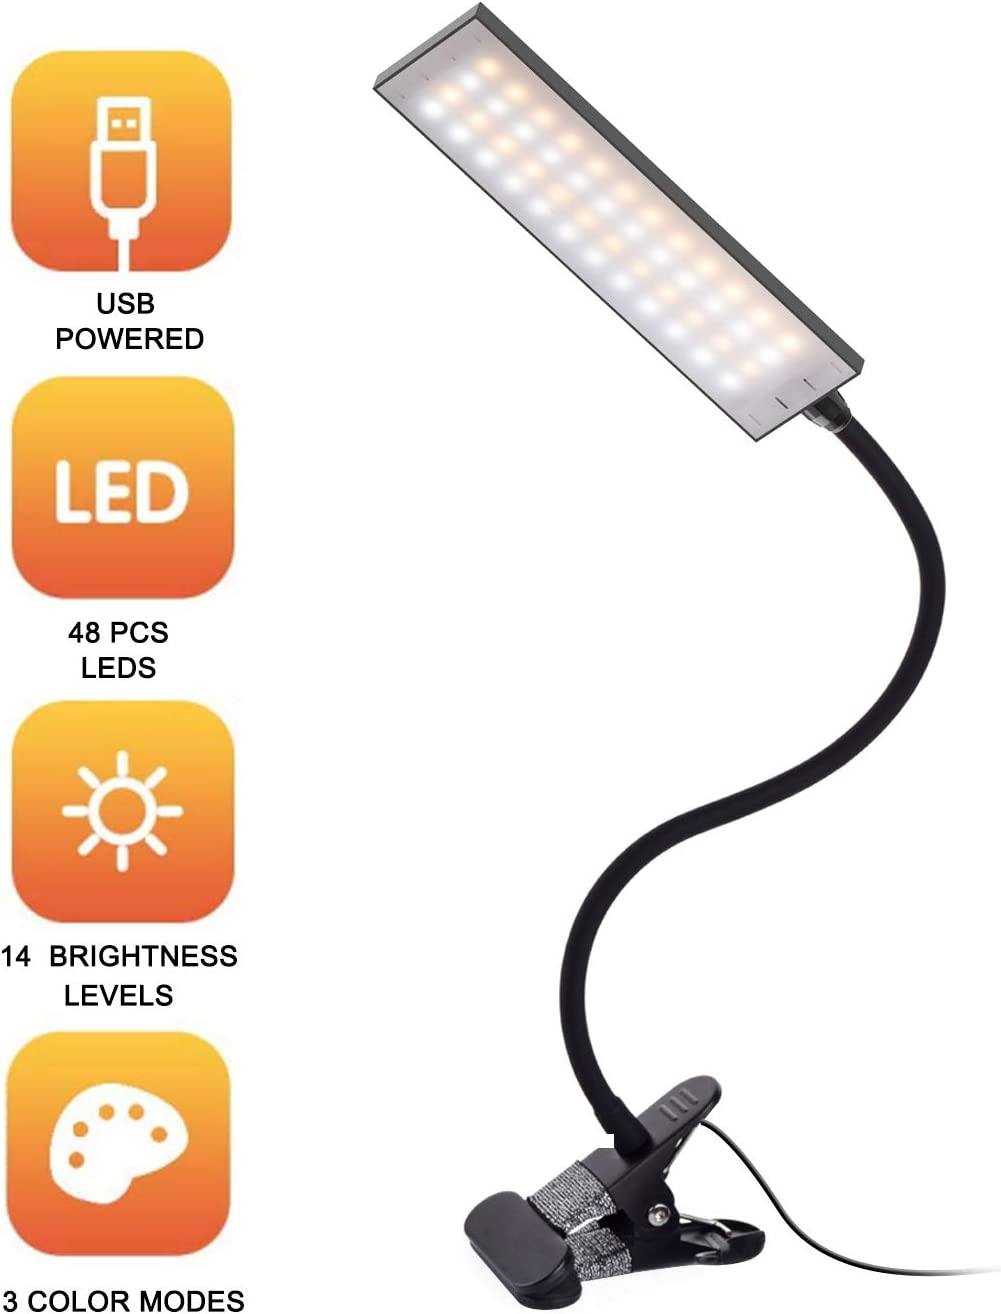 LED Desk Lamp Dimmable Office Home Lamp 14 Level Brightness 3 Color Temperatures 5W LED Reading Light Metal Clip Light USB Powered Flexible Gooseneck Clamp Light, Black